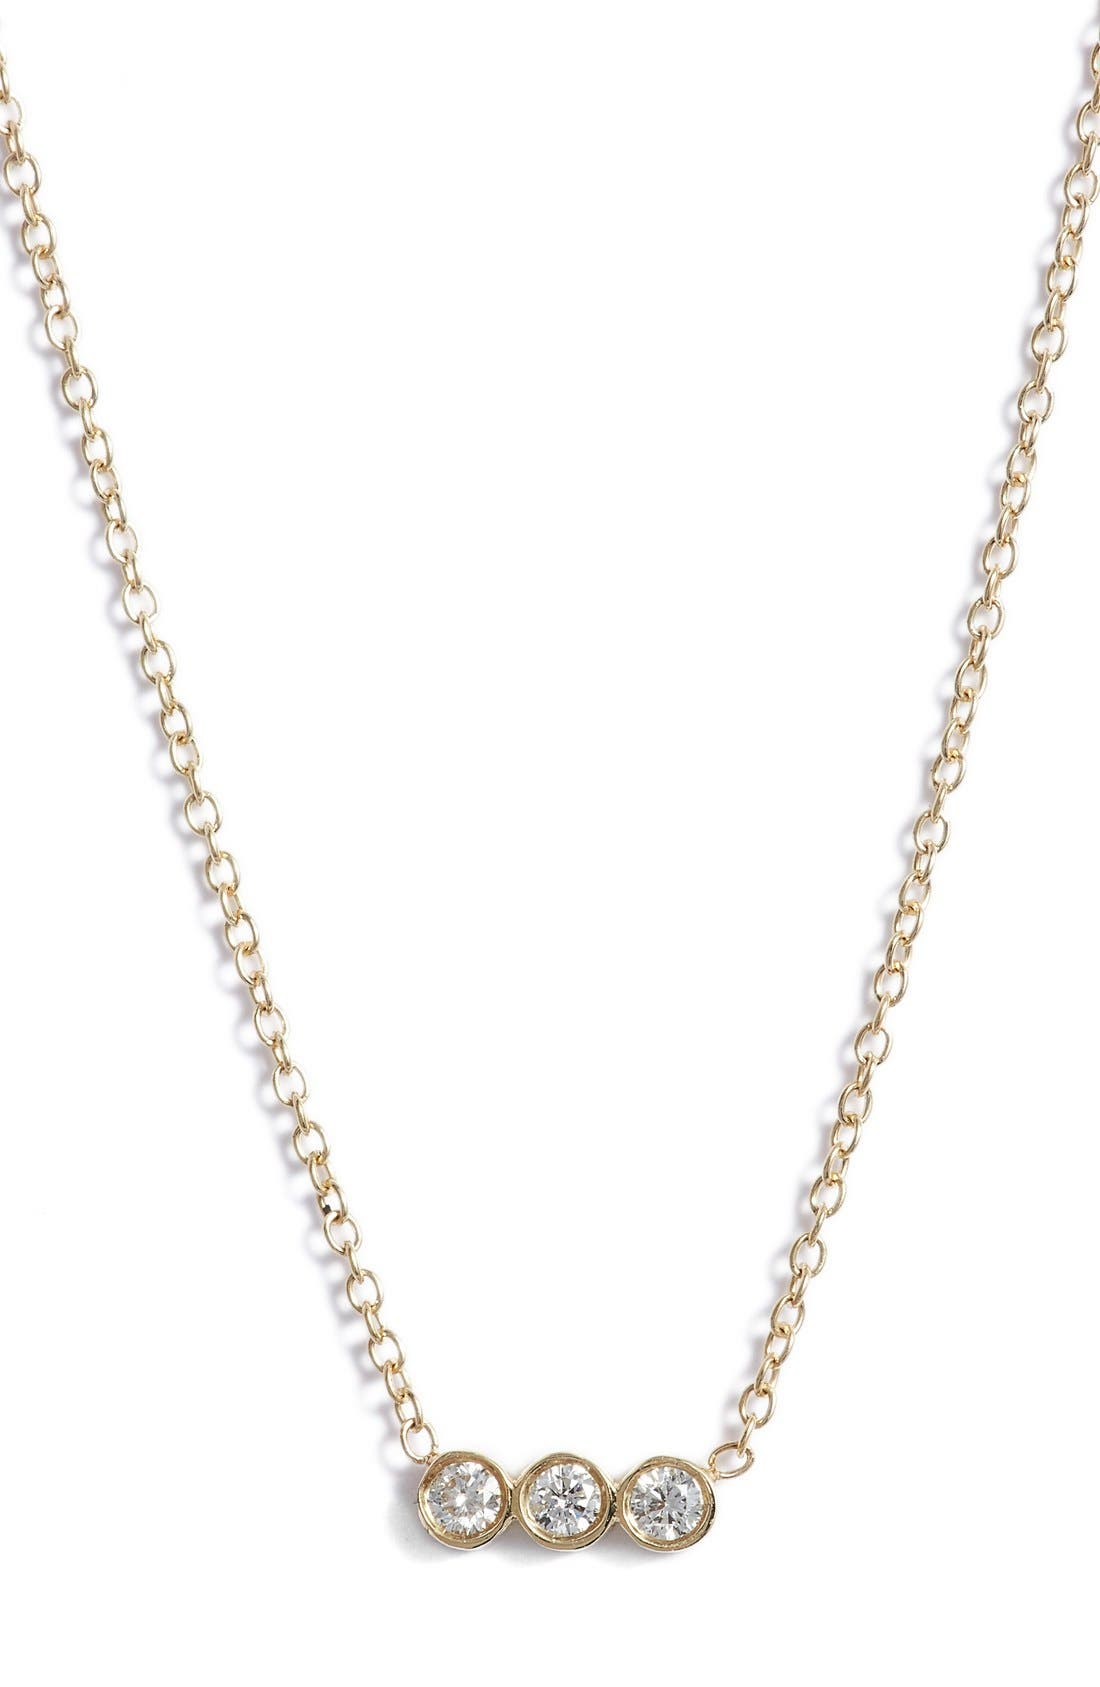 Main Image - Zoë Chicco Diamond Bezel Pendant Necklace